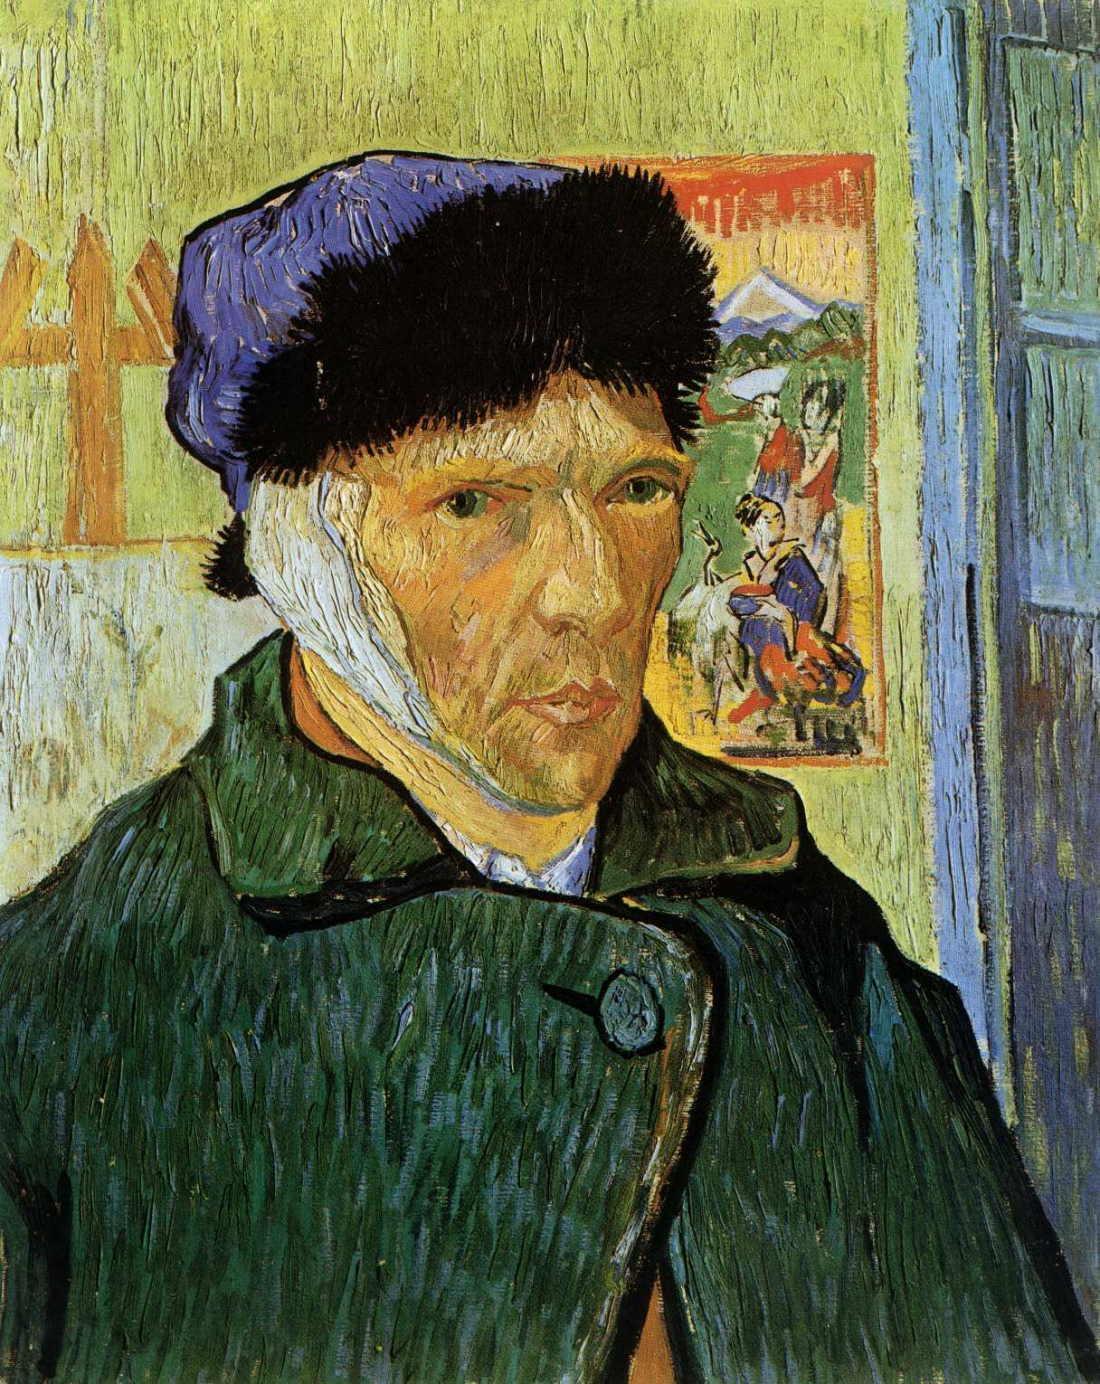 Self Portrait with Badaged Ear